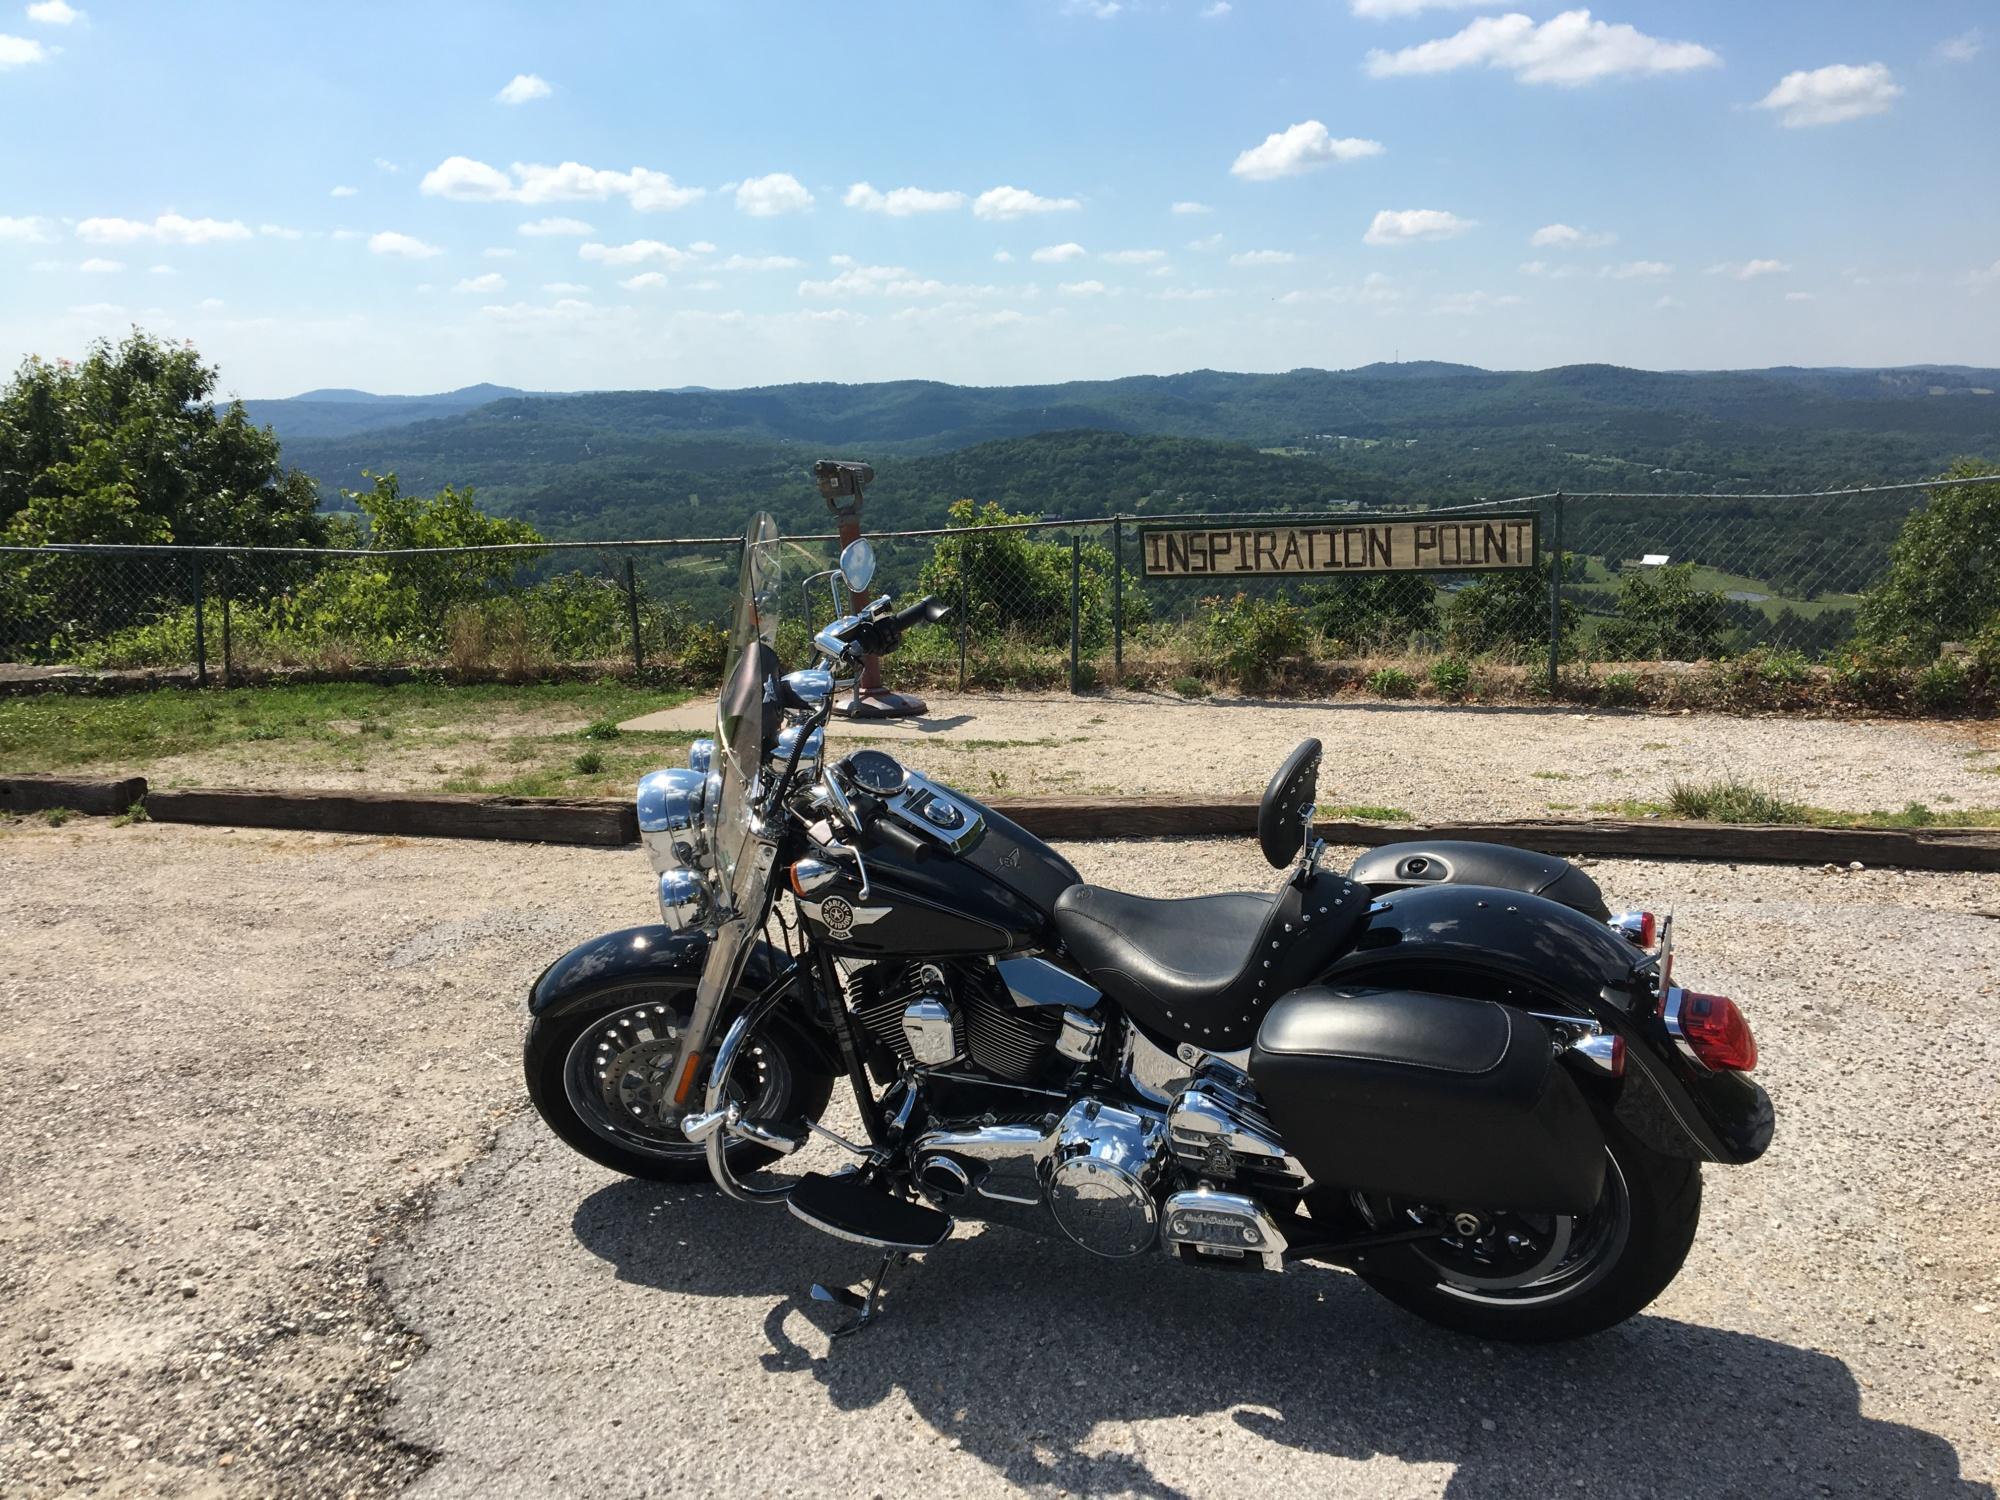 Becky's Biker Blog - Inspiring women to ride motorcycles